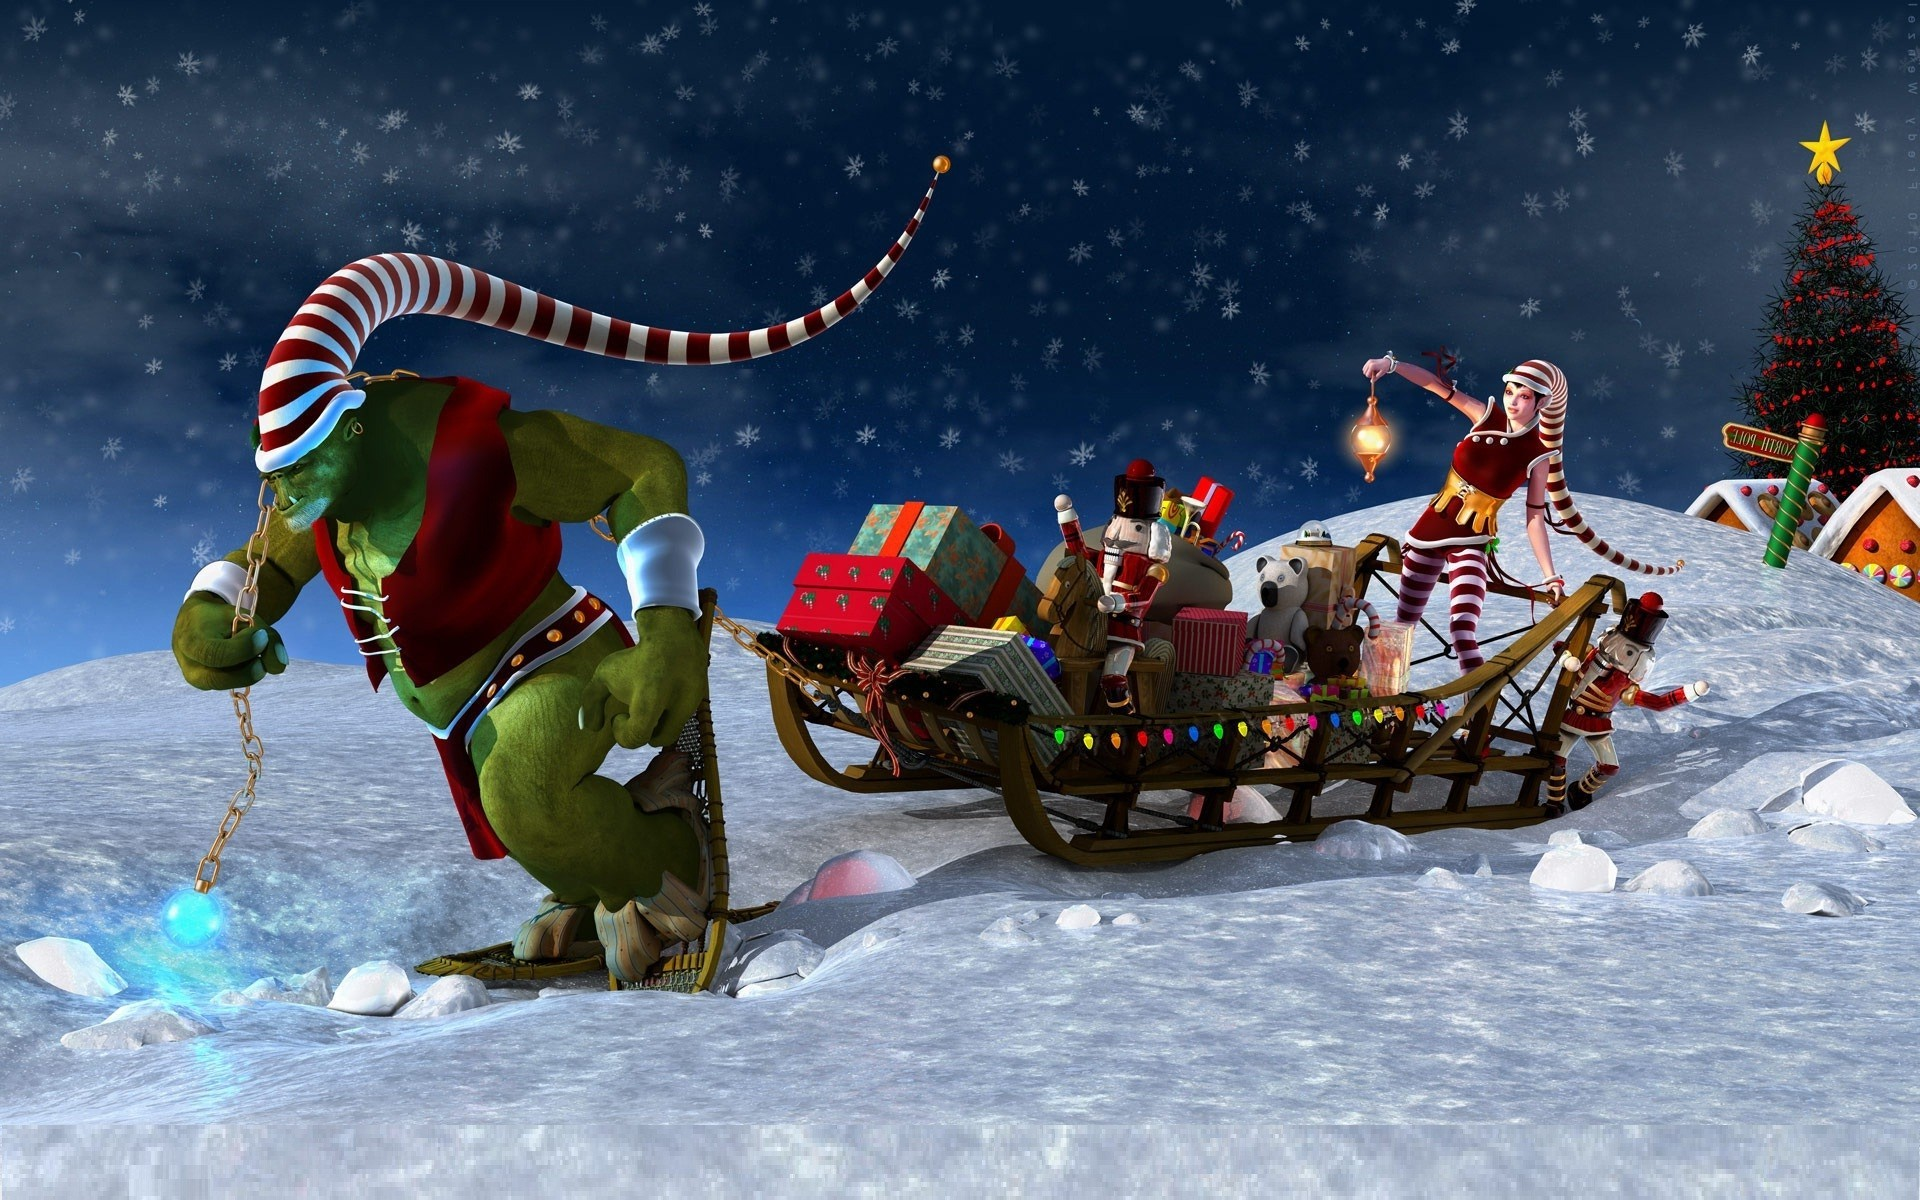 Animated Christmas Backgrounds For Desktop For Desktop